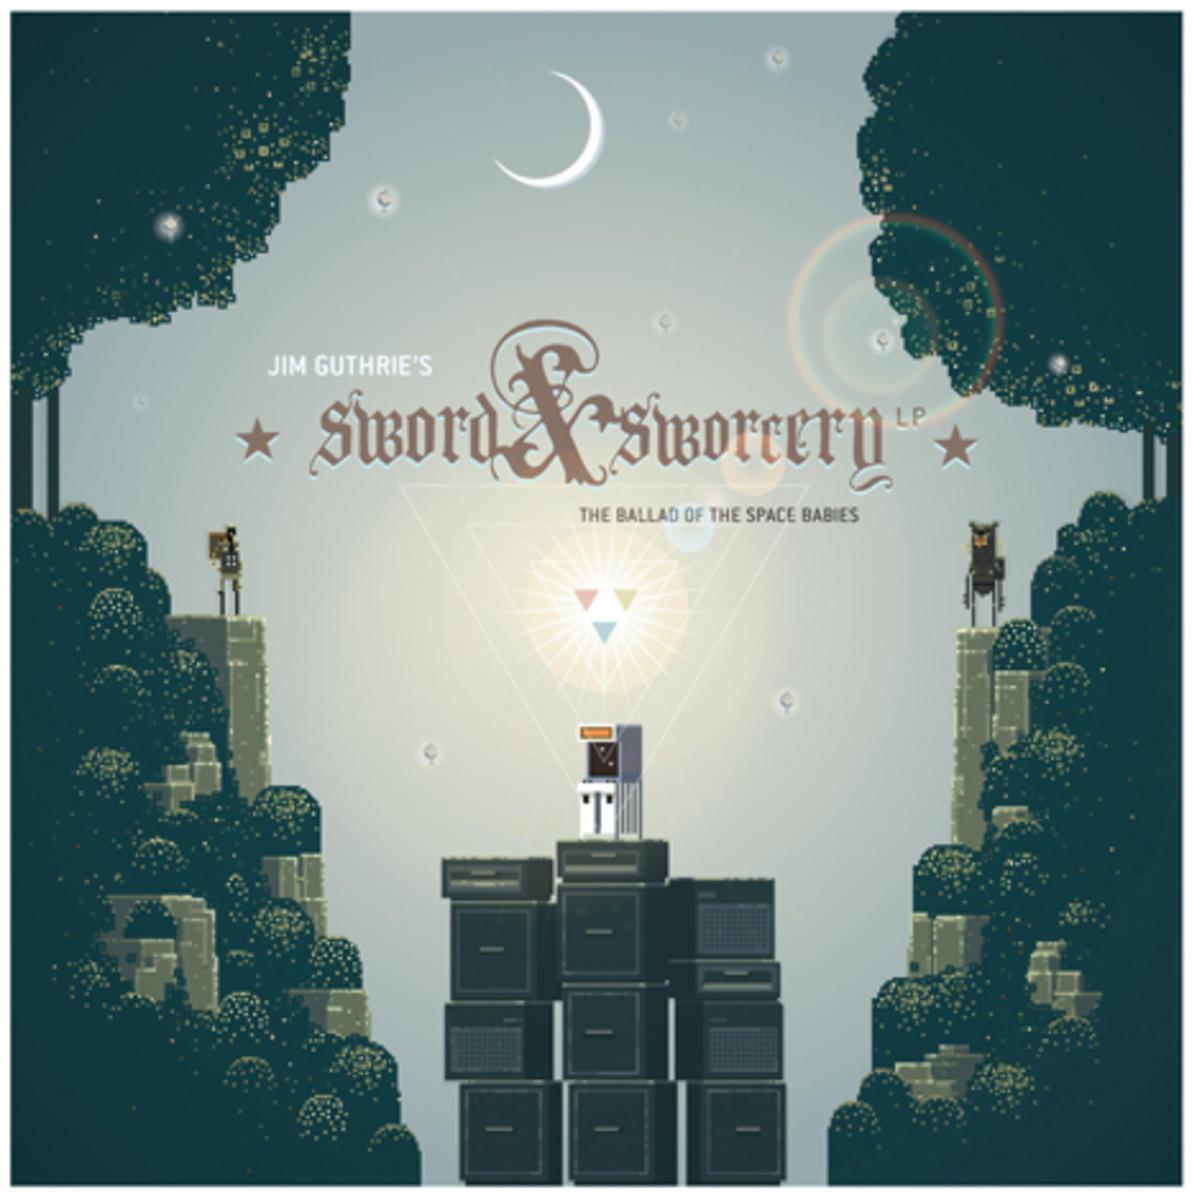 Sword & Sworcery videogame soundtrack